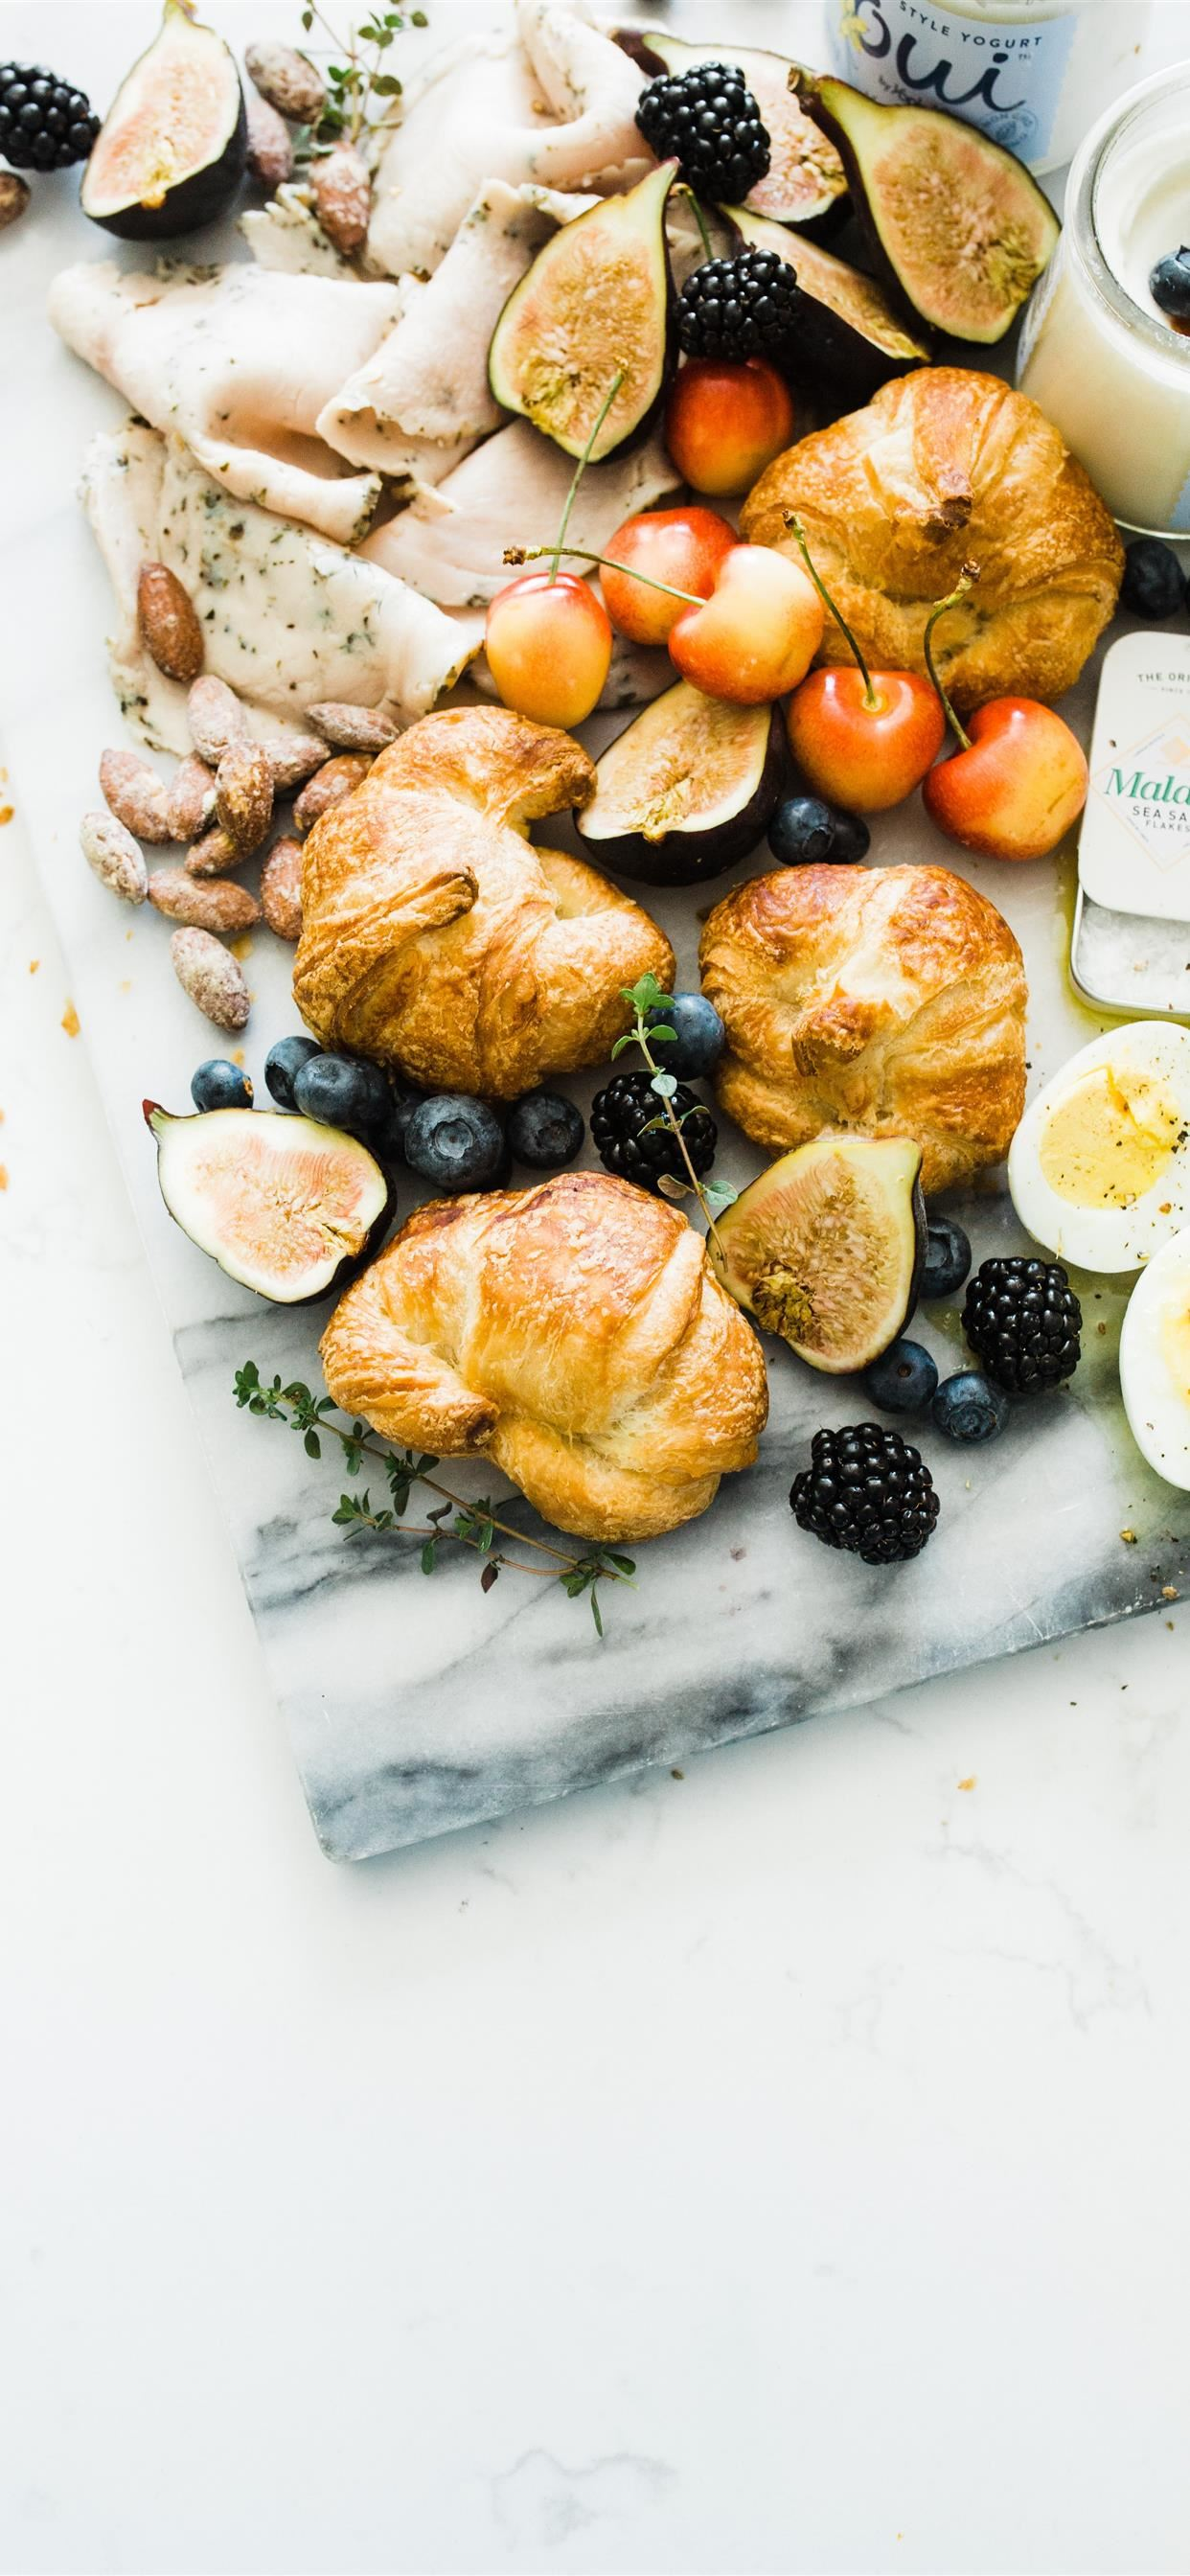 Summer Breakfast Platter iPhone se wallpaper